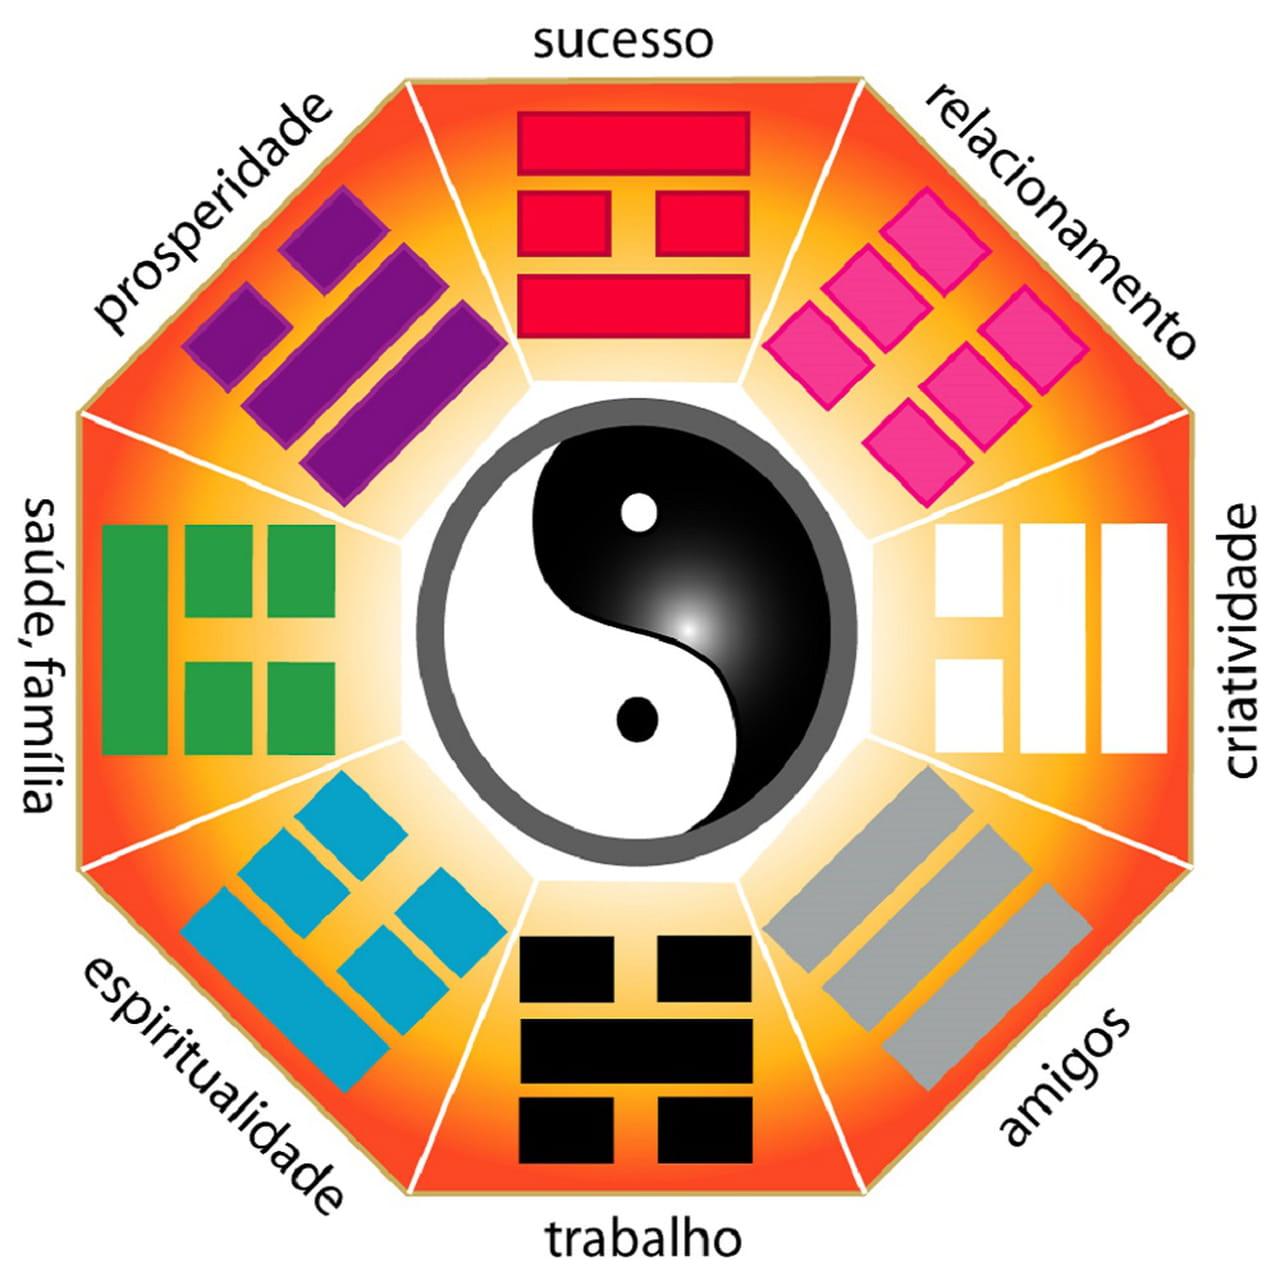 Conhe a o feng shui e descubra como ele pode mudar sua vida for Como practicar feng shui